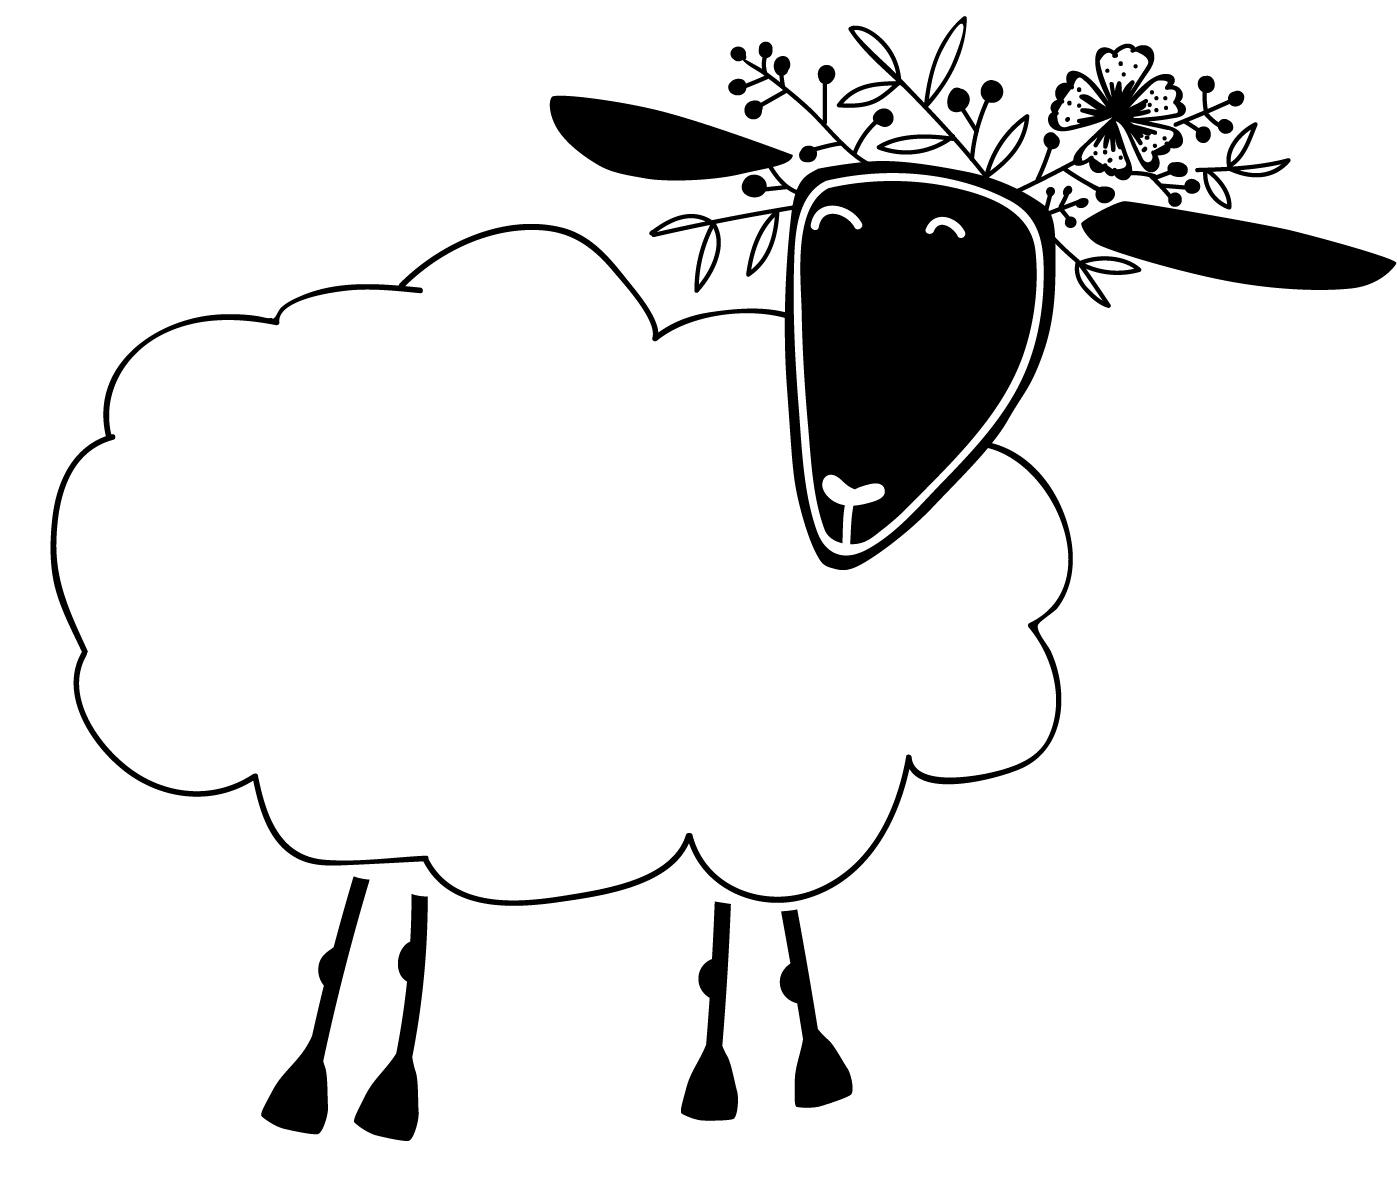 BlacksheepFoods_Logo_01-01.jpg